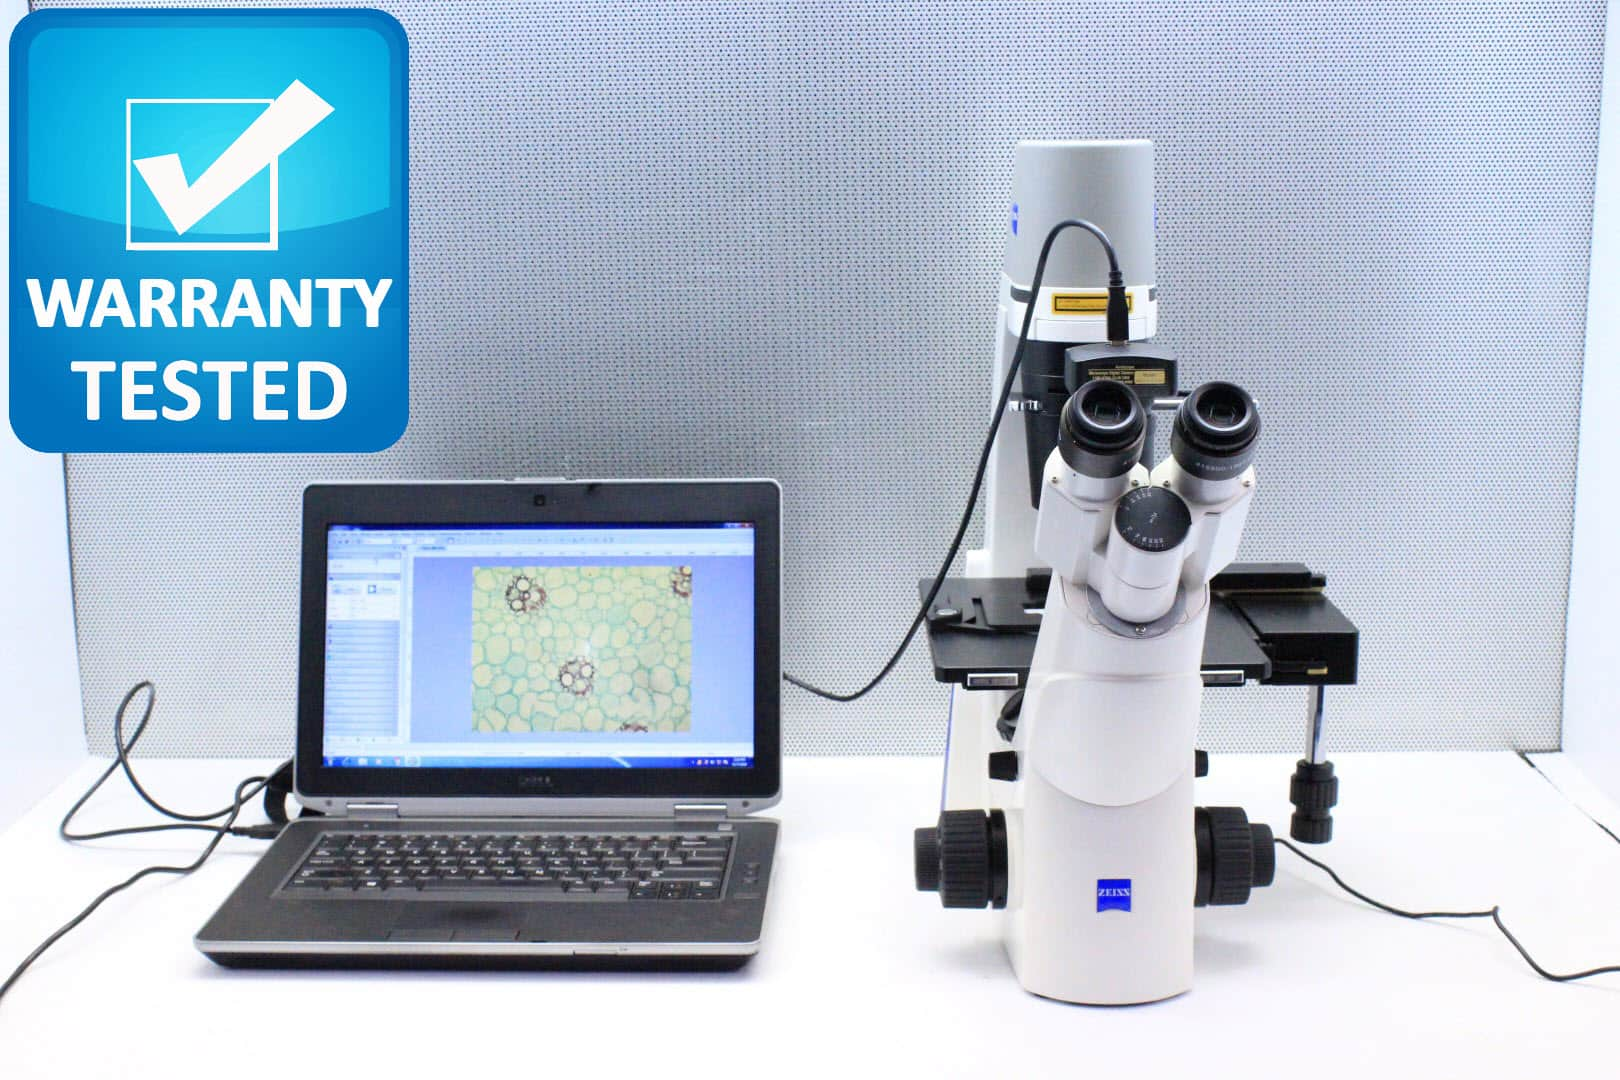 Zeiss PrimoVert Inverted Microscope